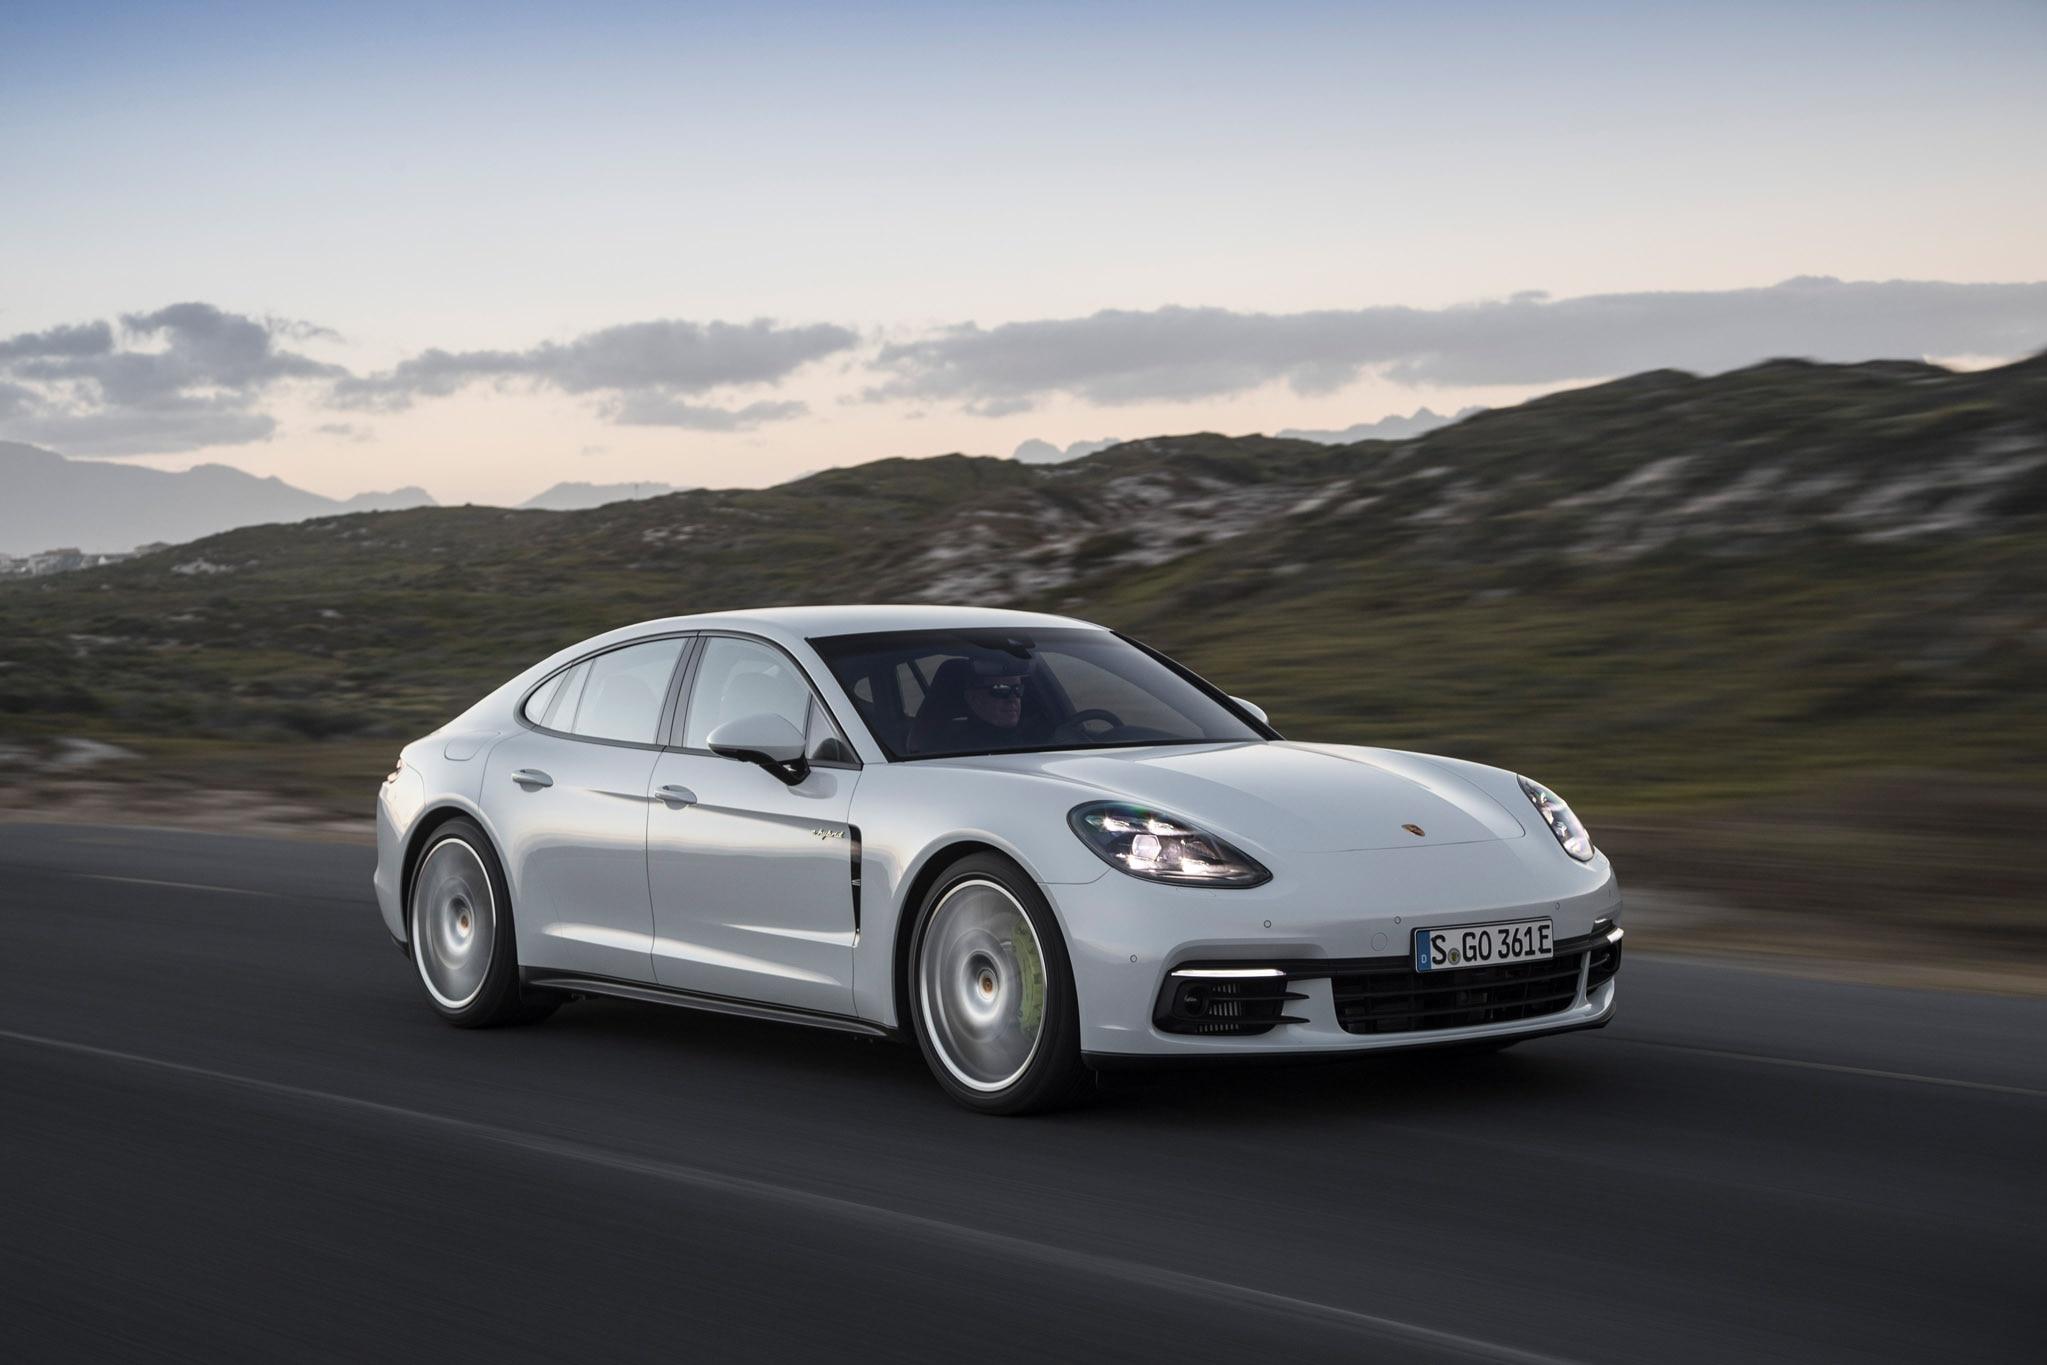 First Drive: 2018 Porsche Panamera 4 E-Hybrid | Automobile ...